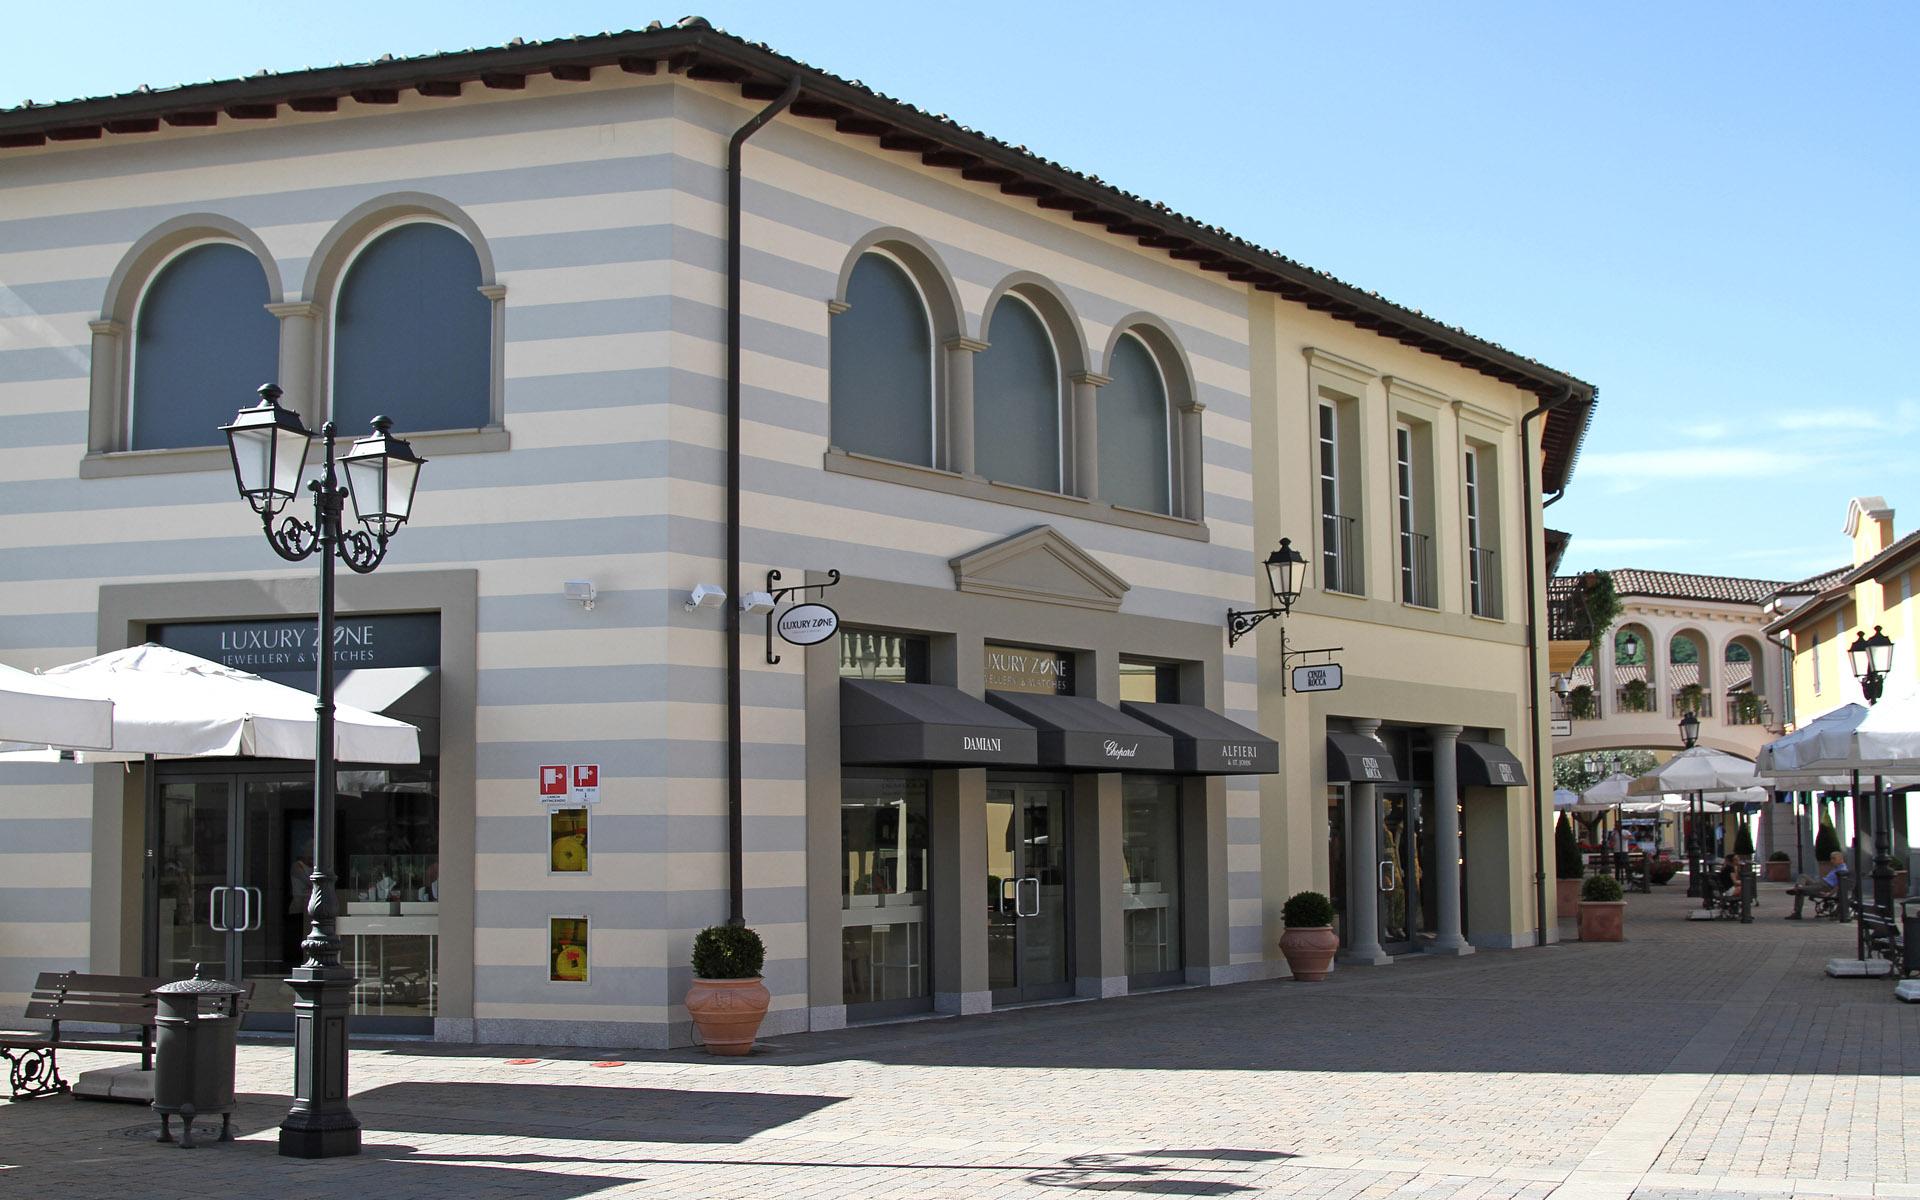 Serravalle designer outlet r p engineering for Serravalle designer outlet milan